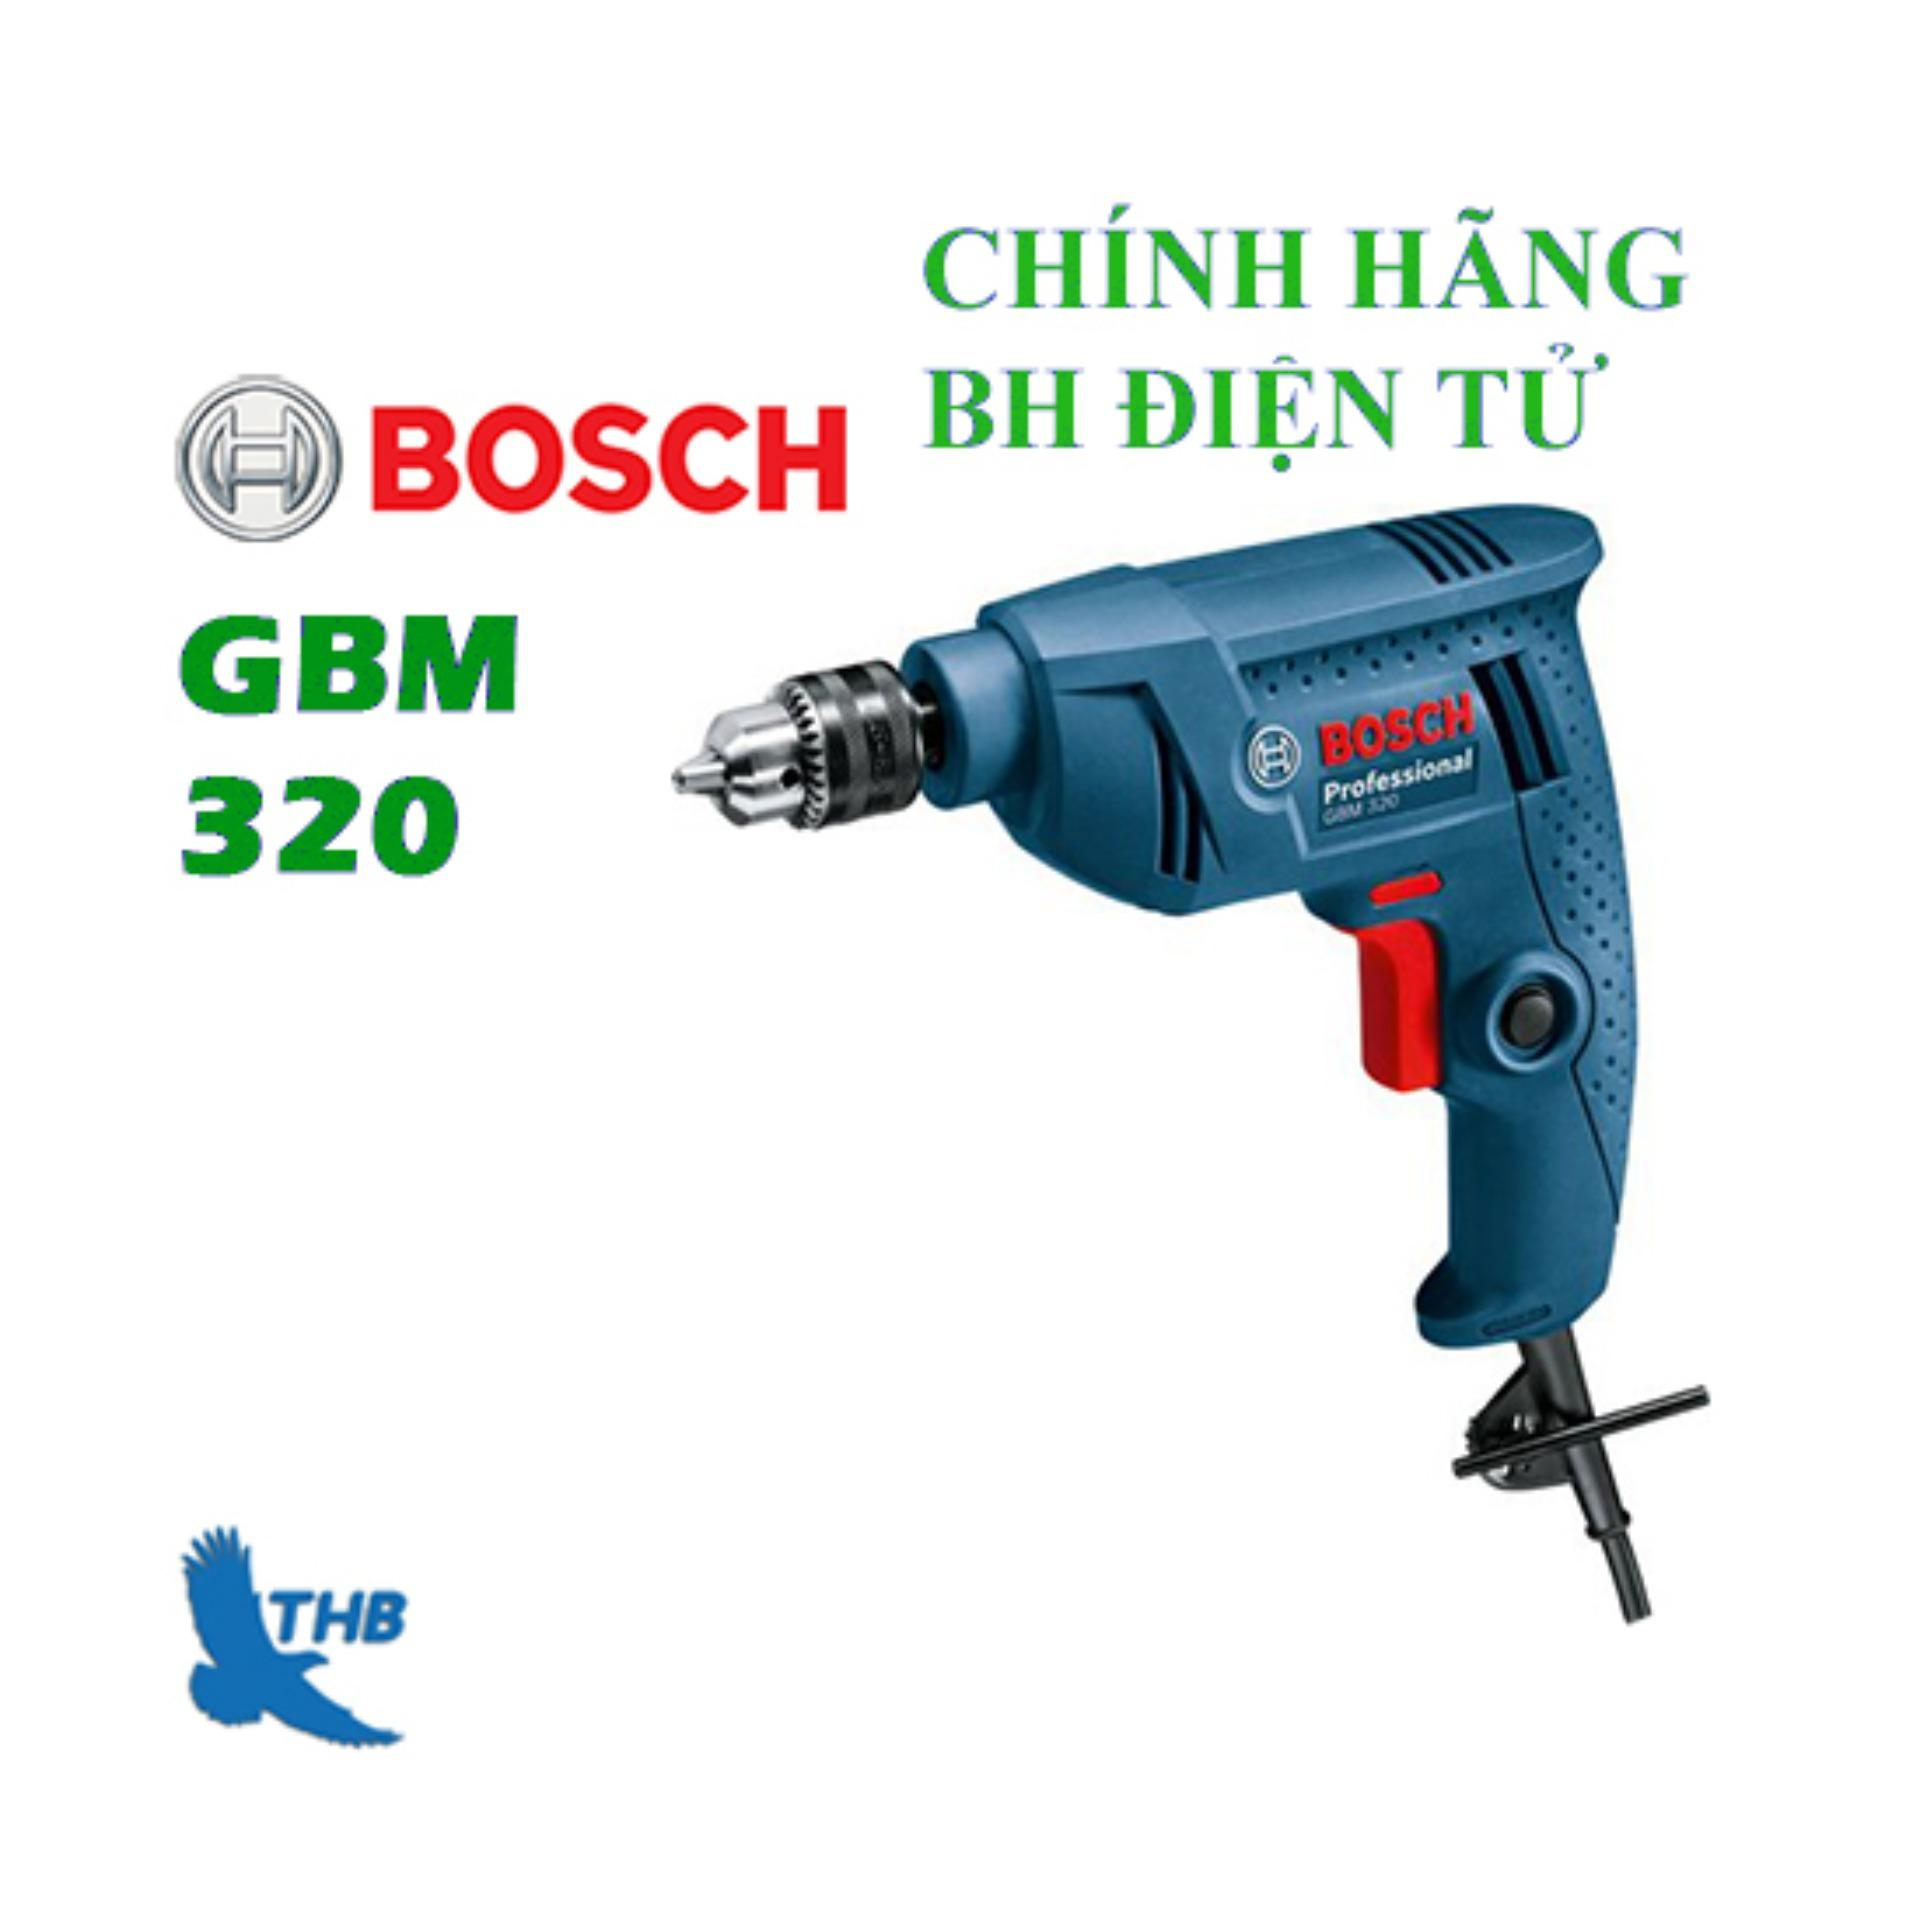 Máy khoan cẩm tay Bosch GBM 320